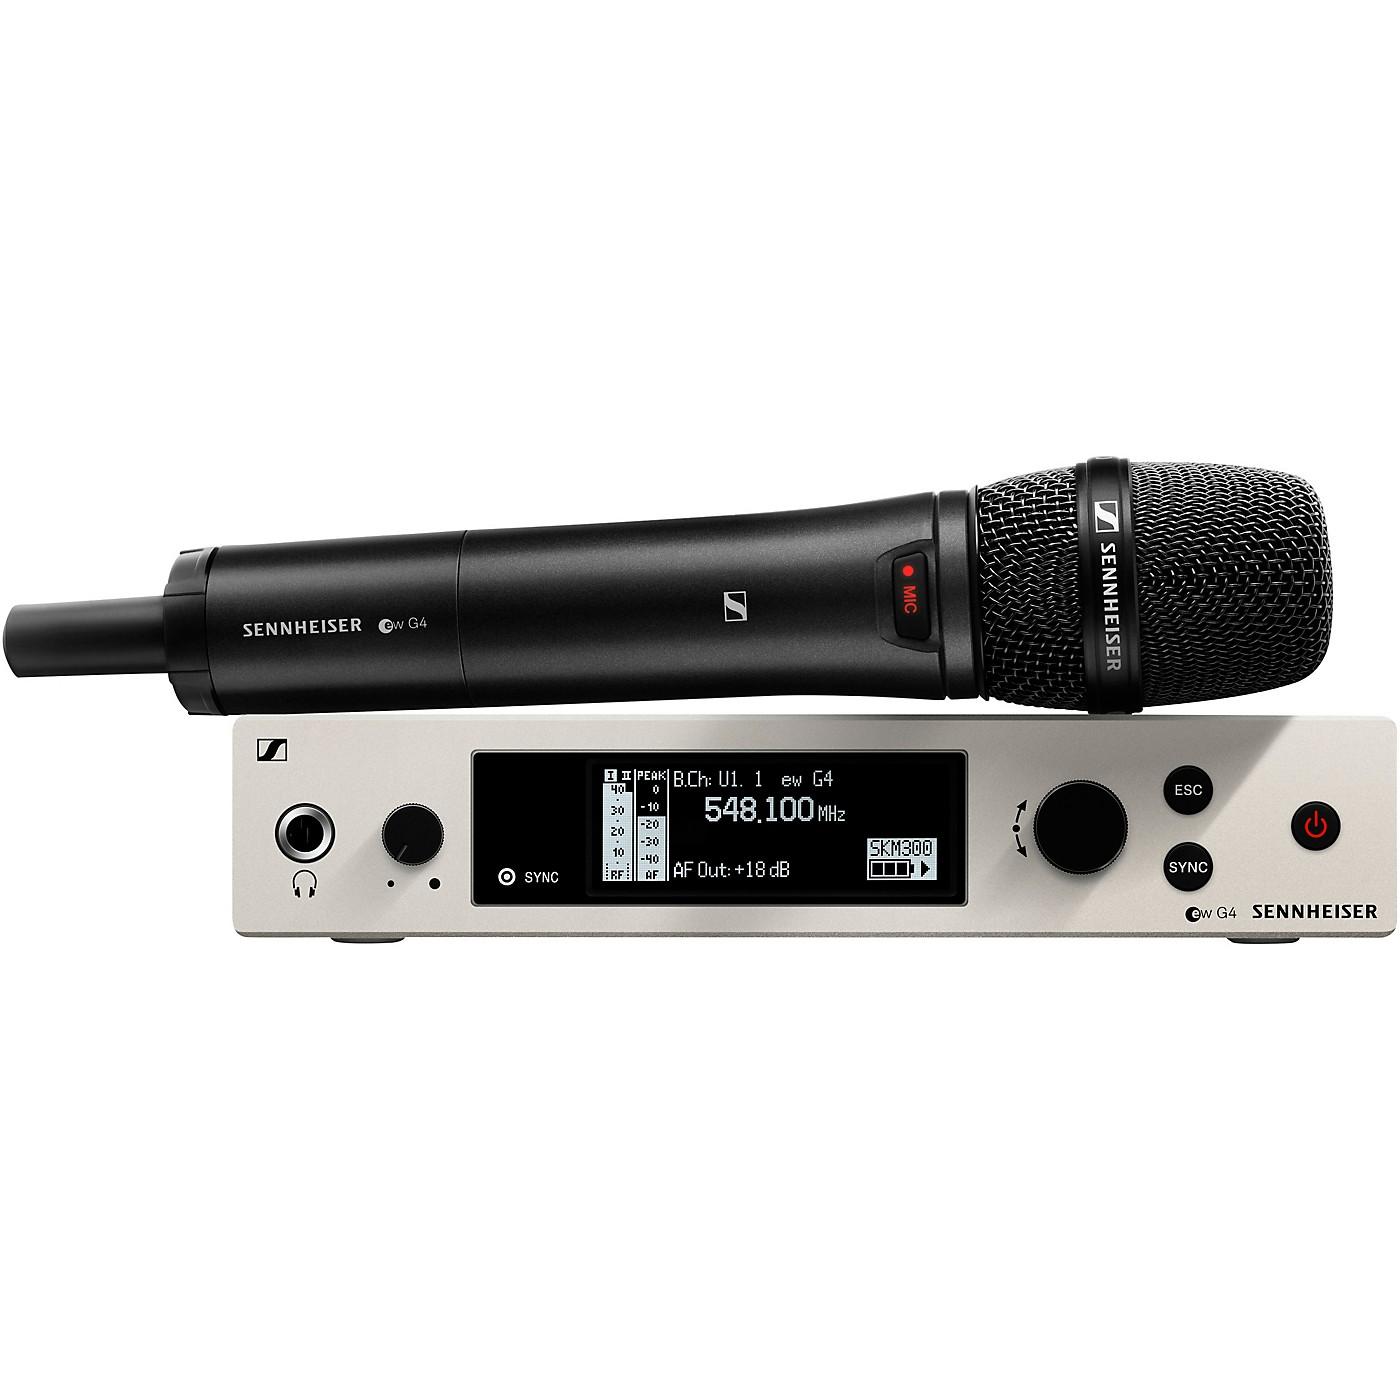 Sennheiser EW 300 G4-BASE-SKM-S Handheld Wireless System, No Capsule thumbnail